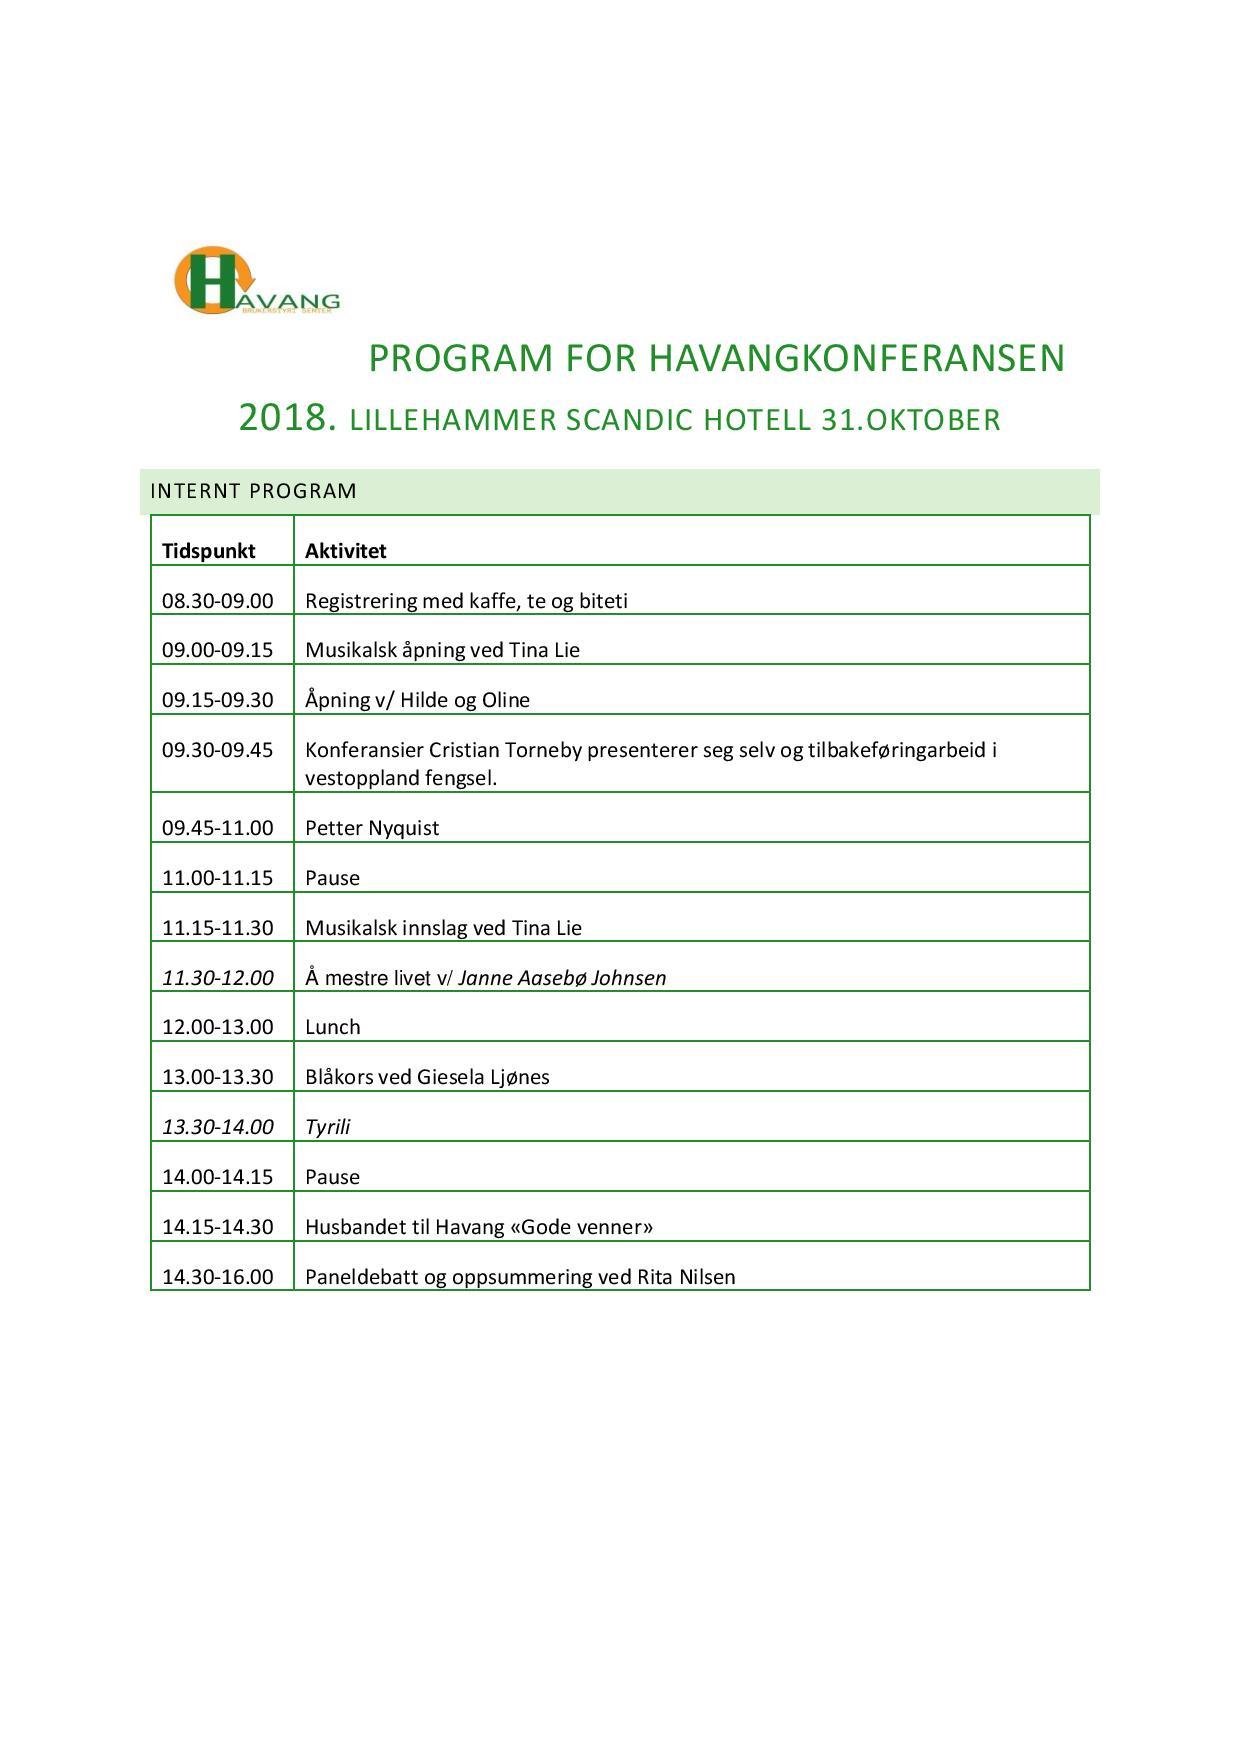 Program for Havangkonferansen 2018-page-001